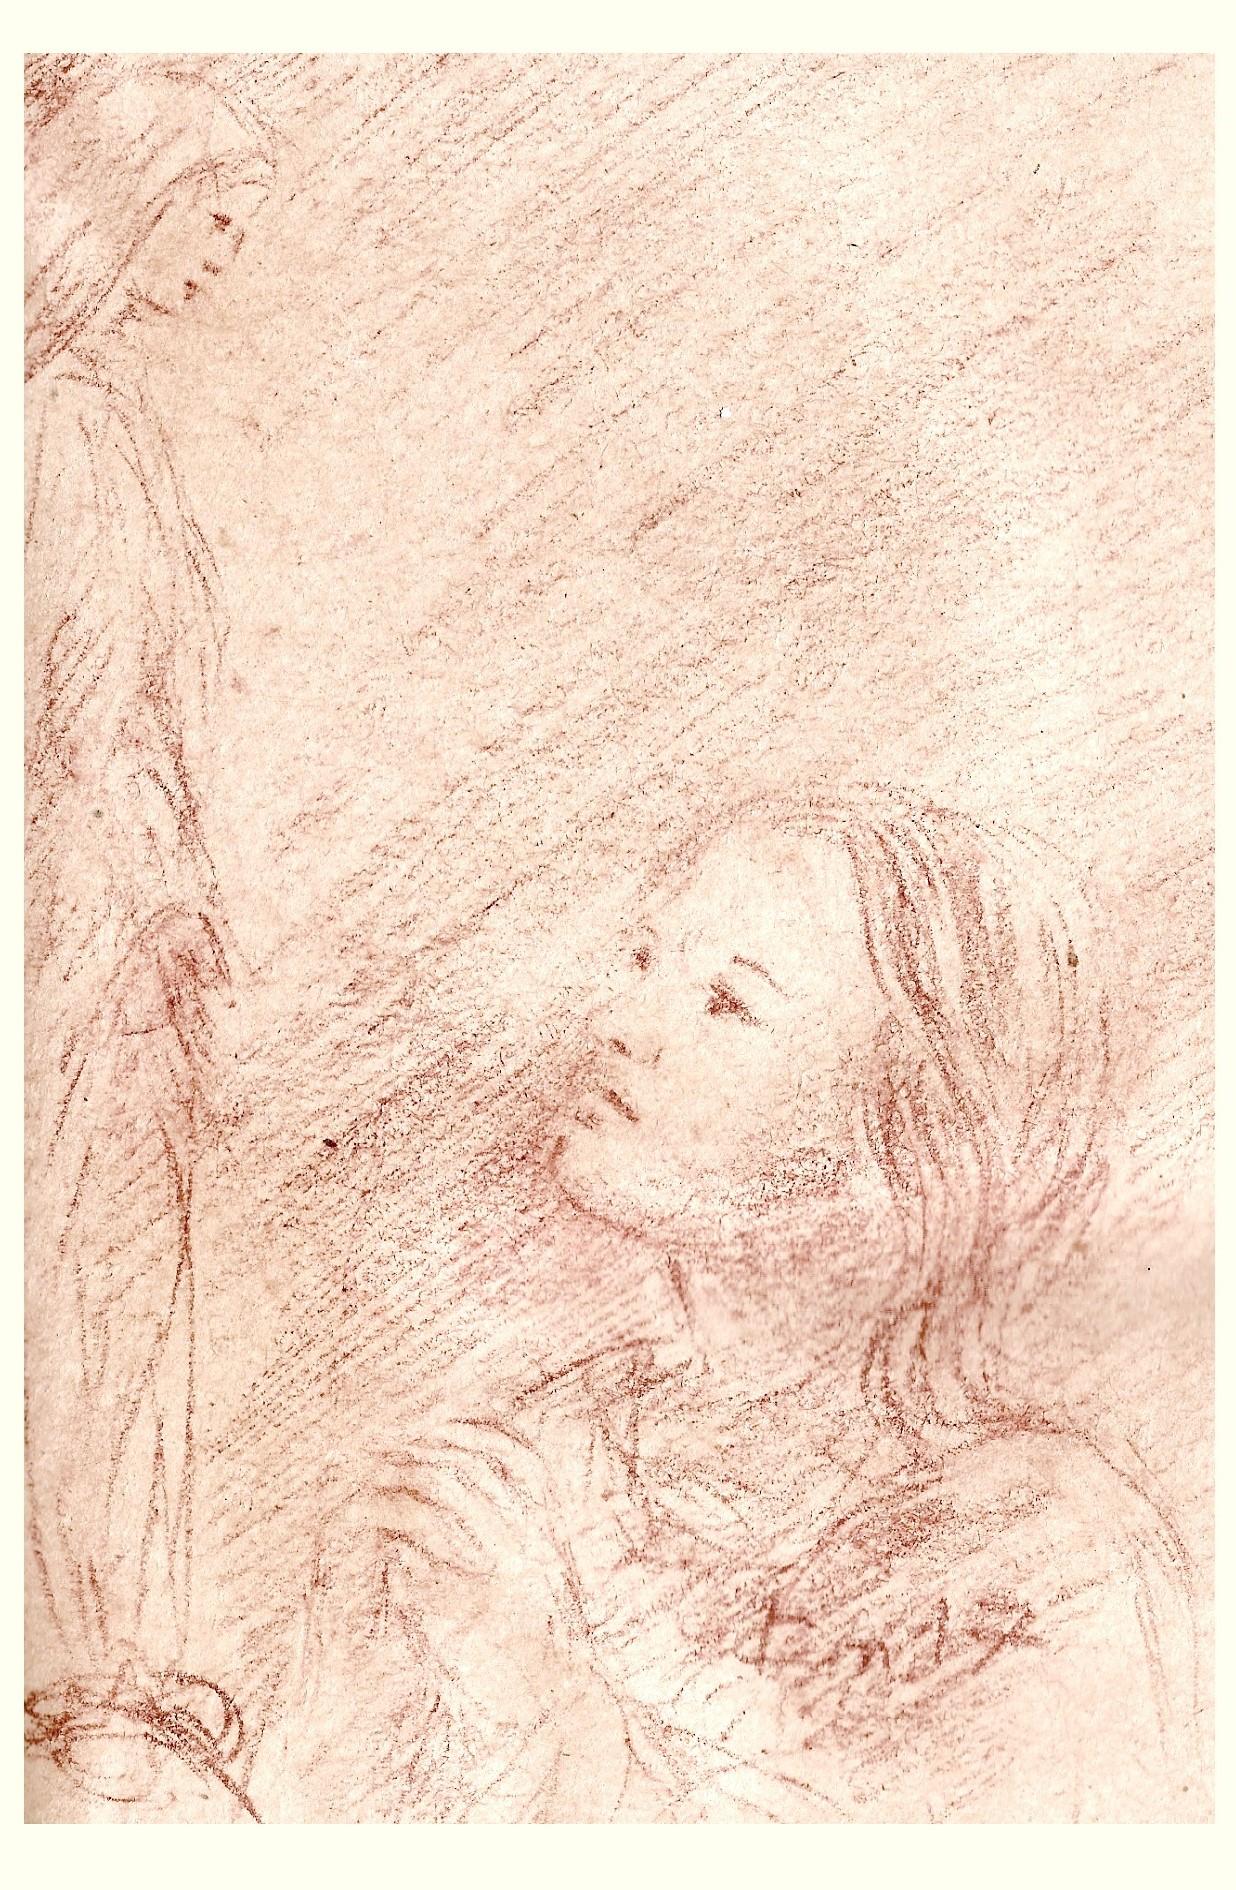 Recueil du rossignol poeme et sanguine de jean joseph chevalier 18